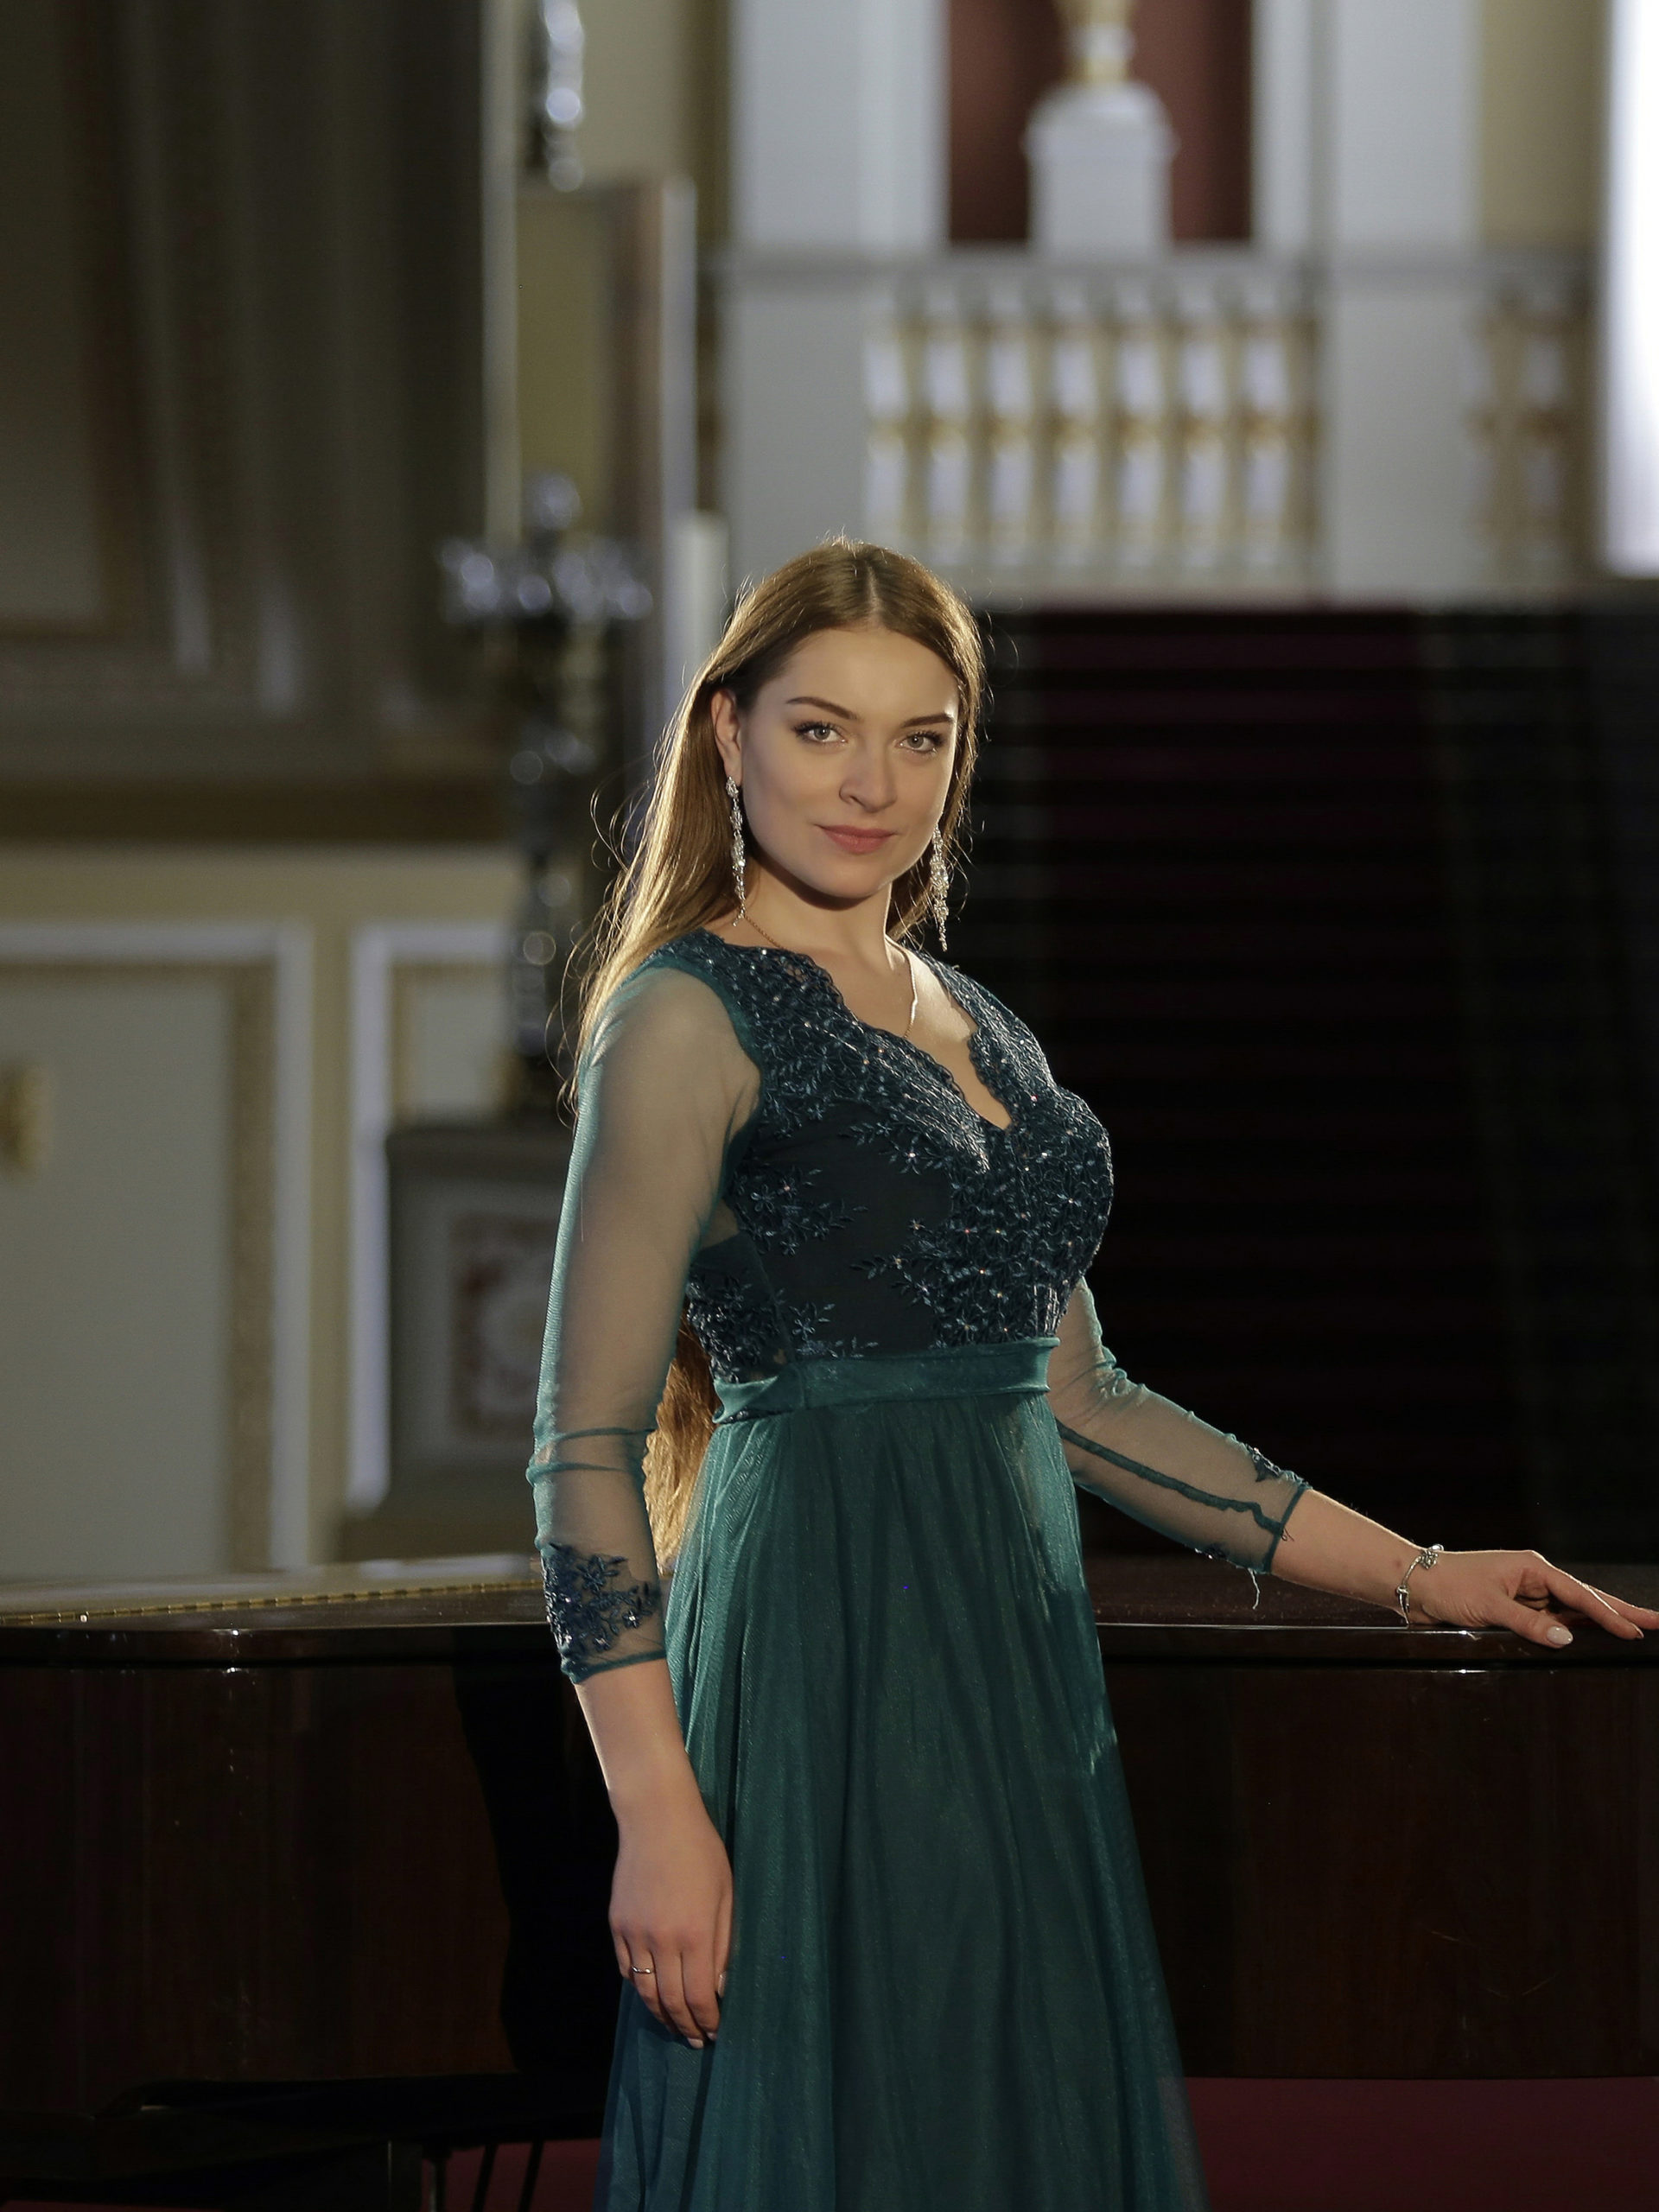 Мельникова Анастасия Вячеславовна